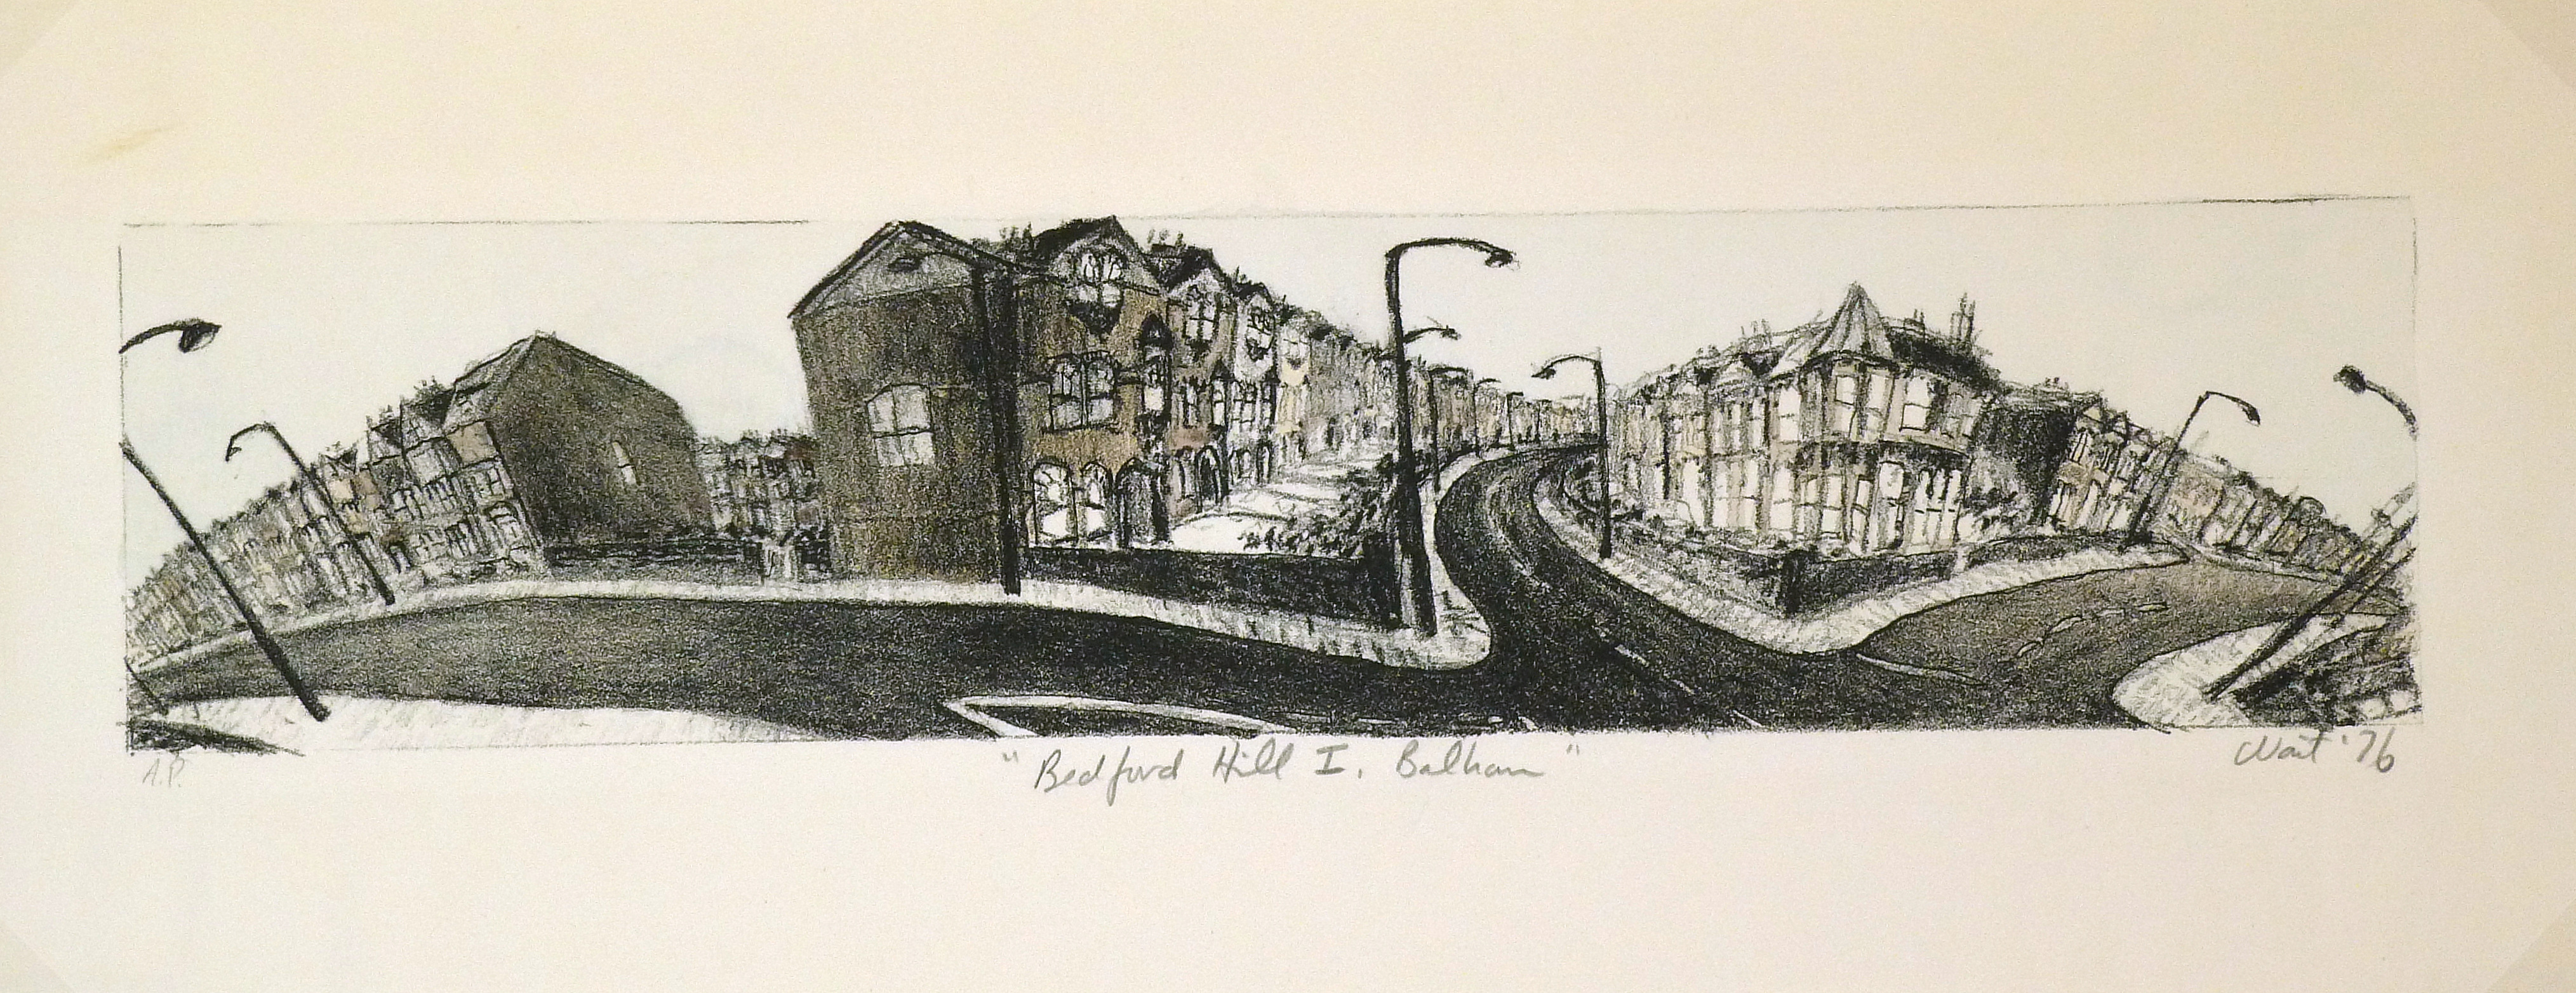 Bedford Hill Print, 1976-main-8277K